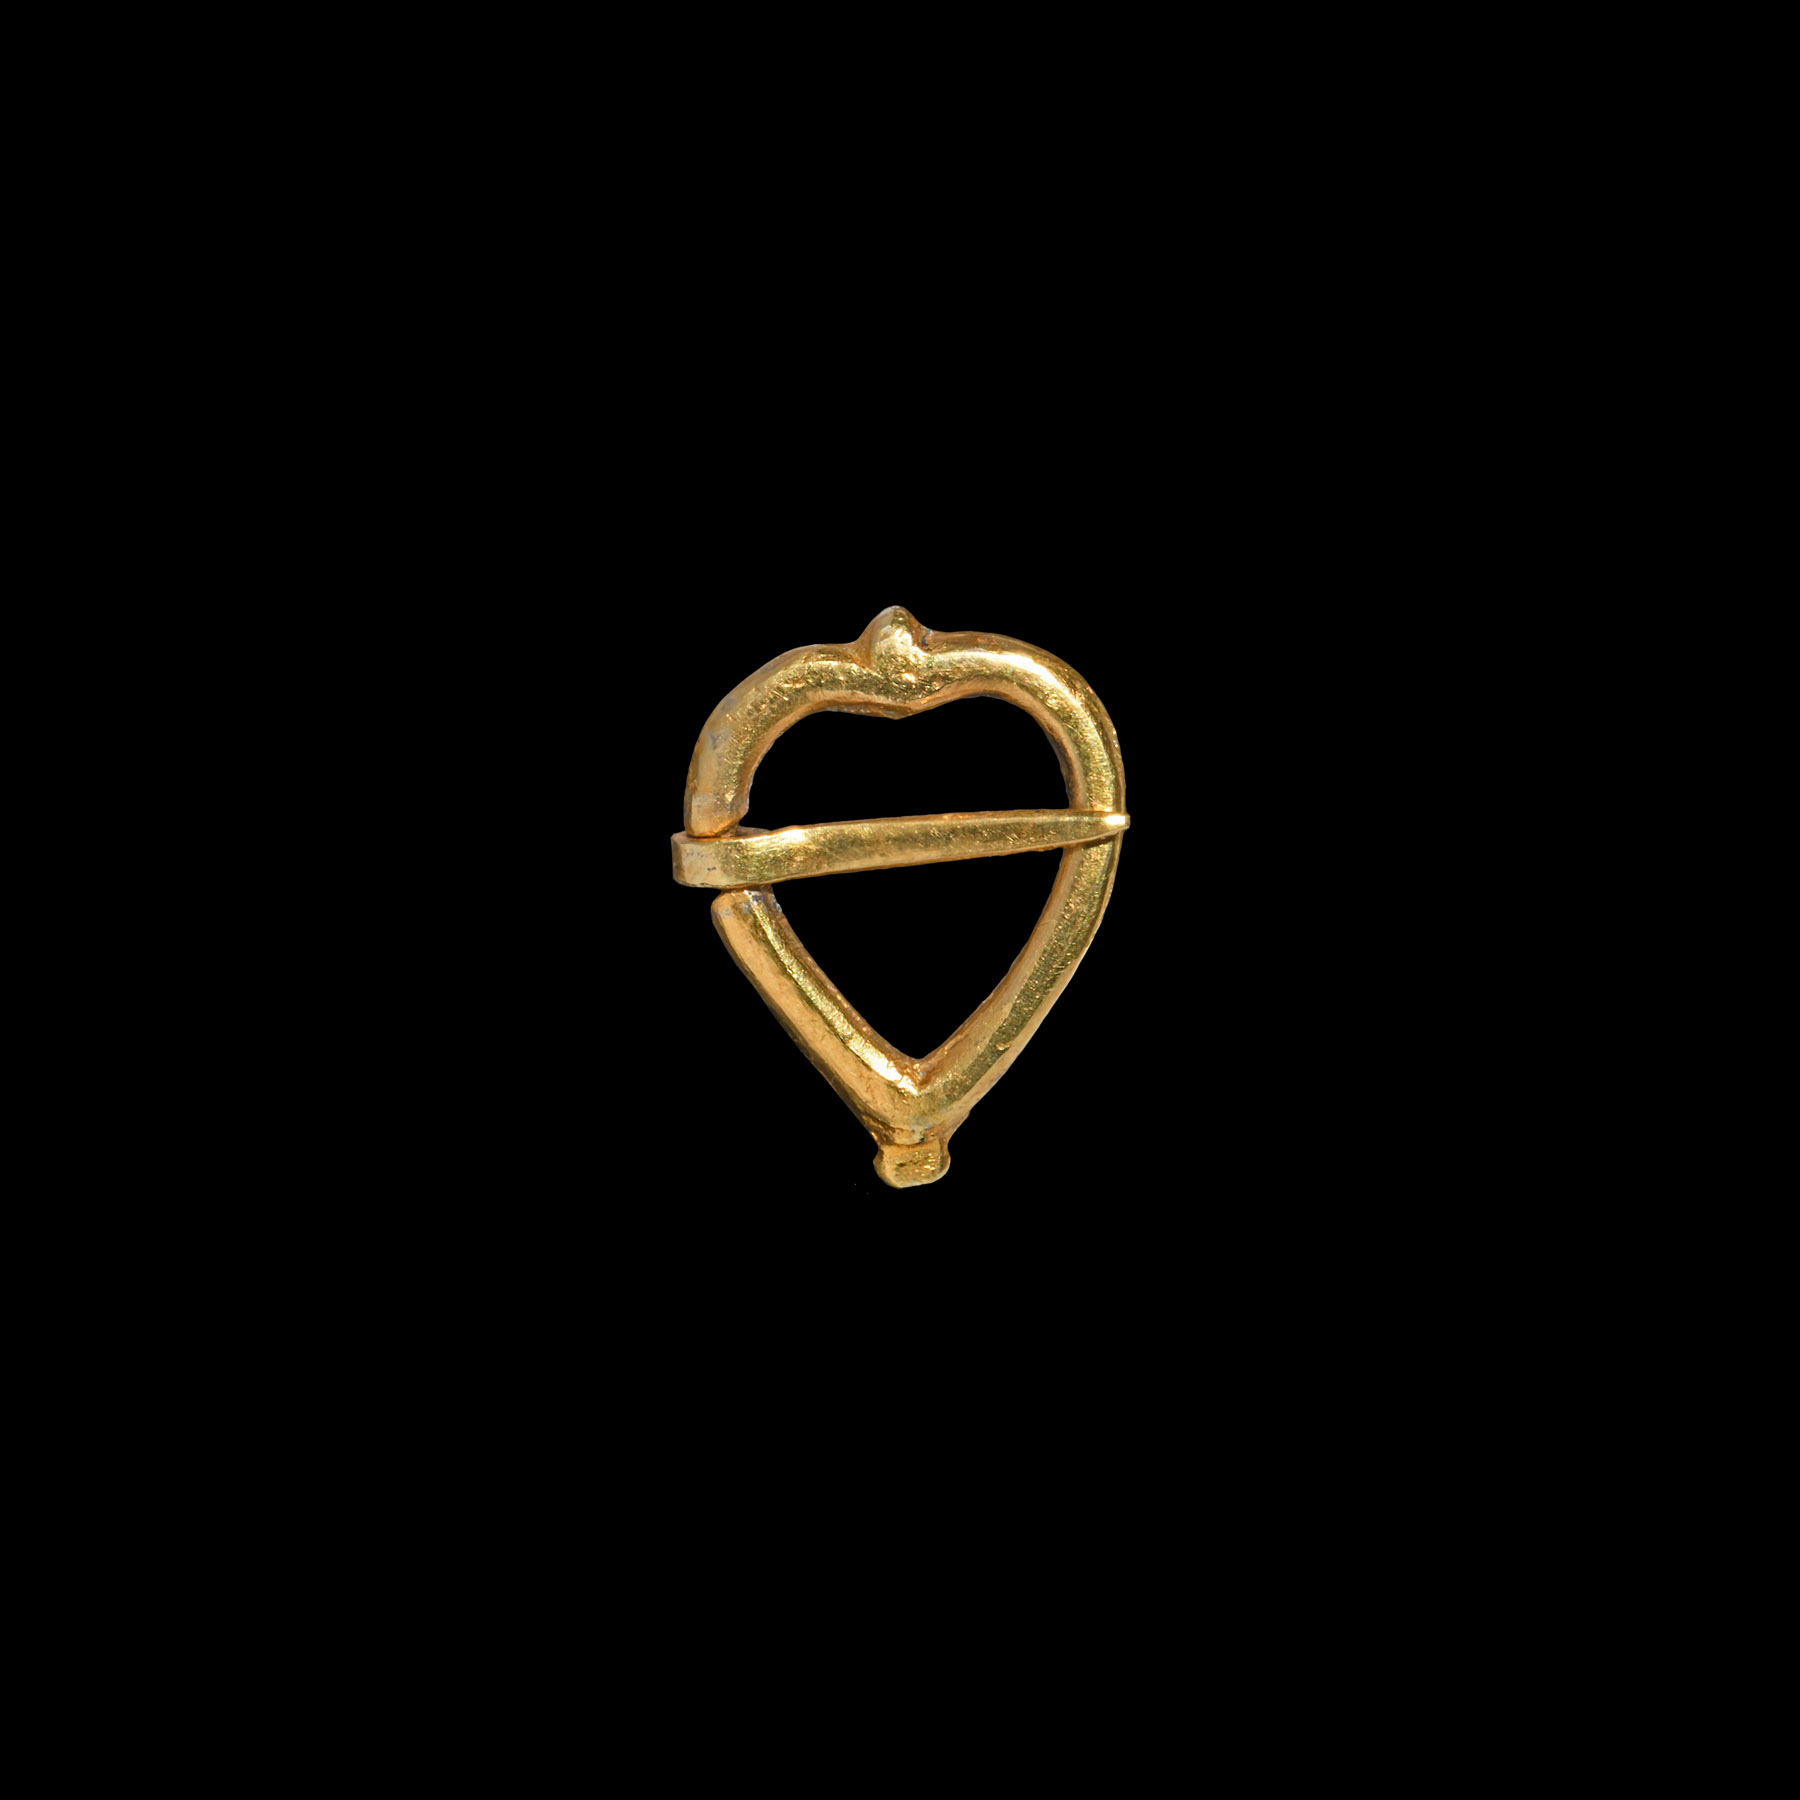 Post Medieval Gilt Silver Heart-Shaped Ring Brooch